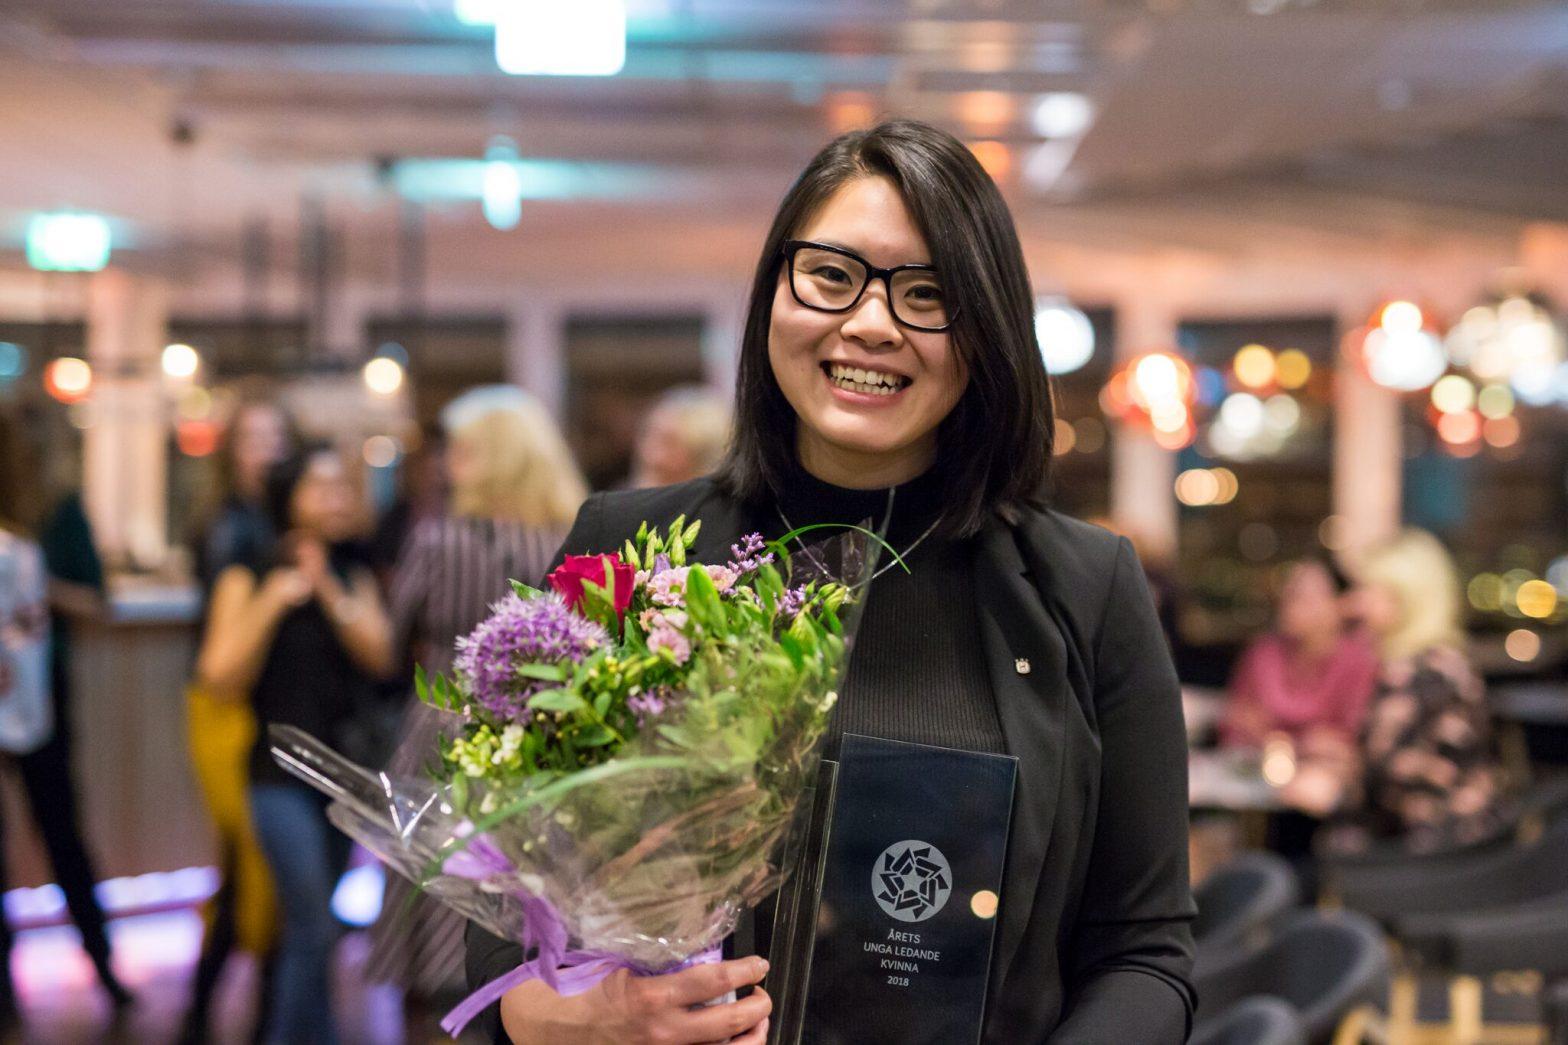 helen-truong-arets-unga-ledande-kvinna-2018